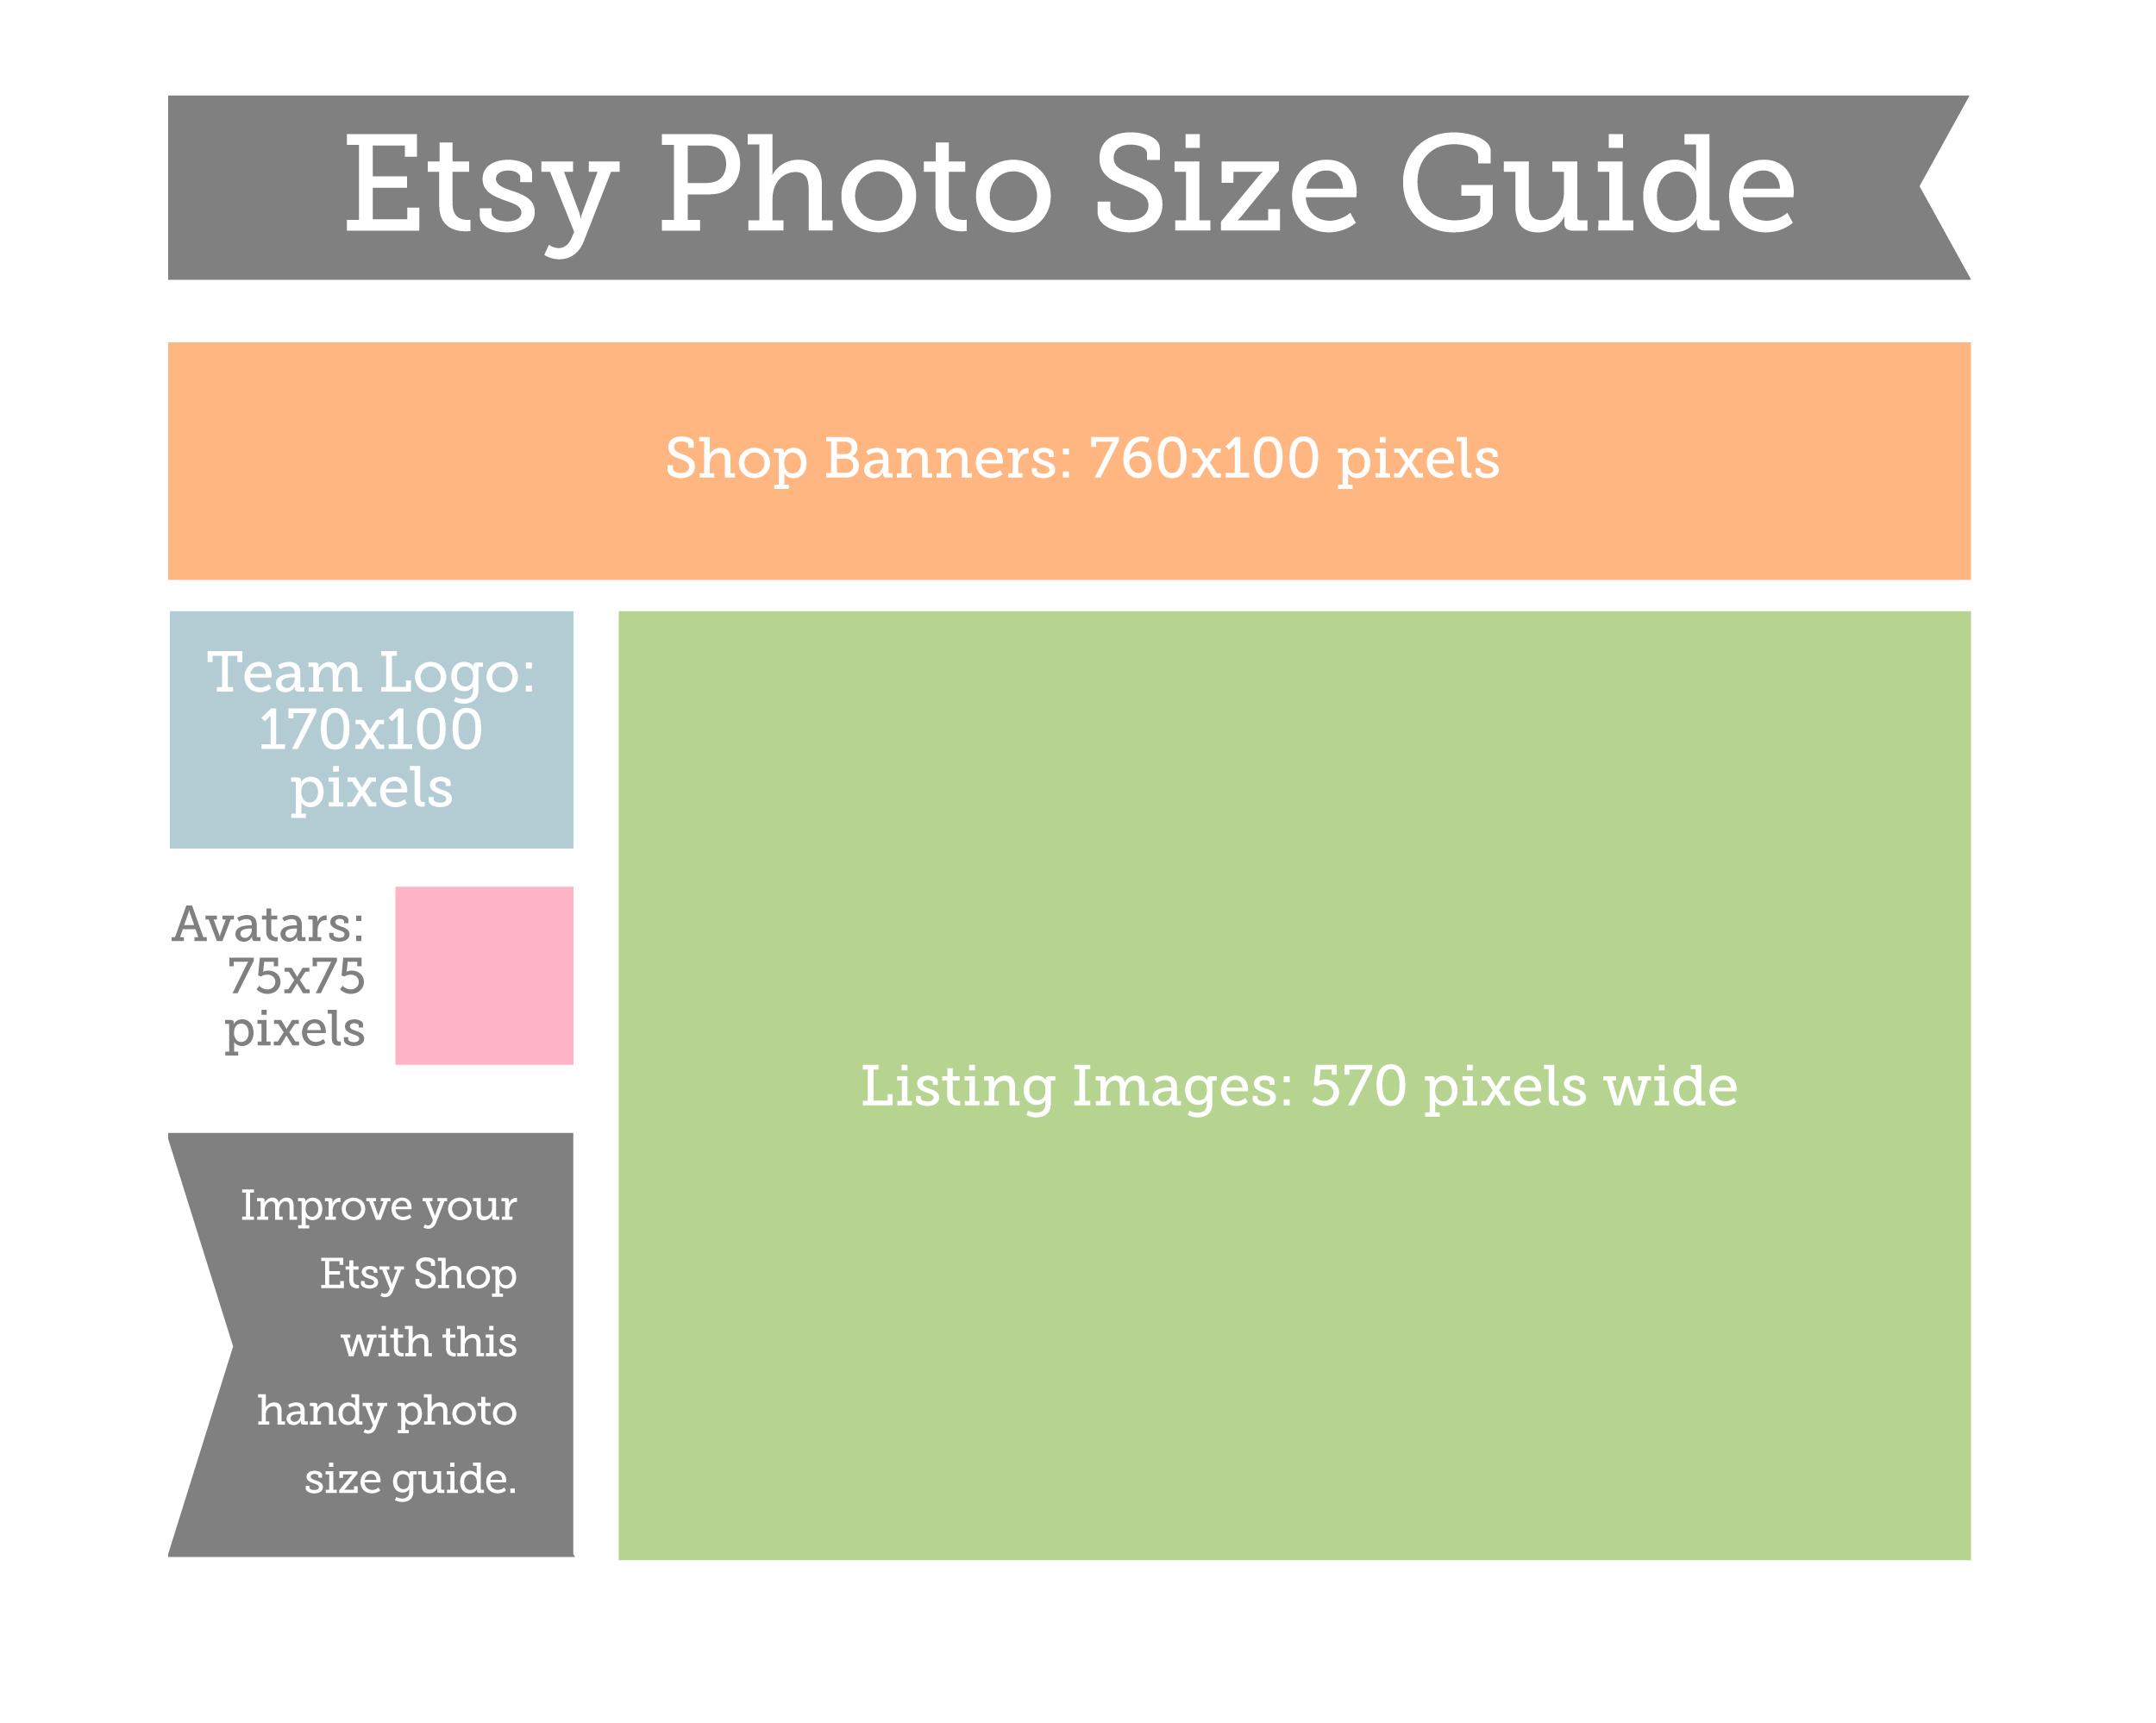 etsy photo size guide hitchcock creative. Black Bedroom Furniture Sets. Home Design Ideas